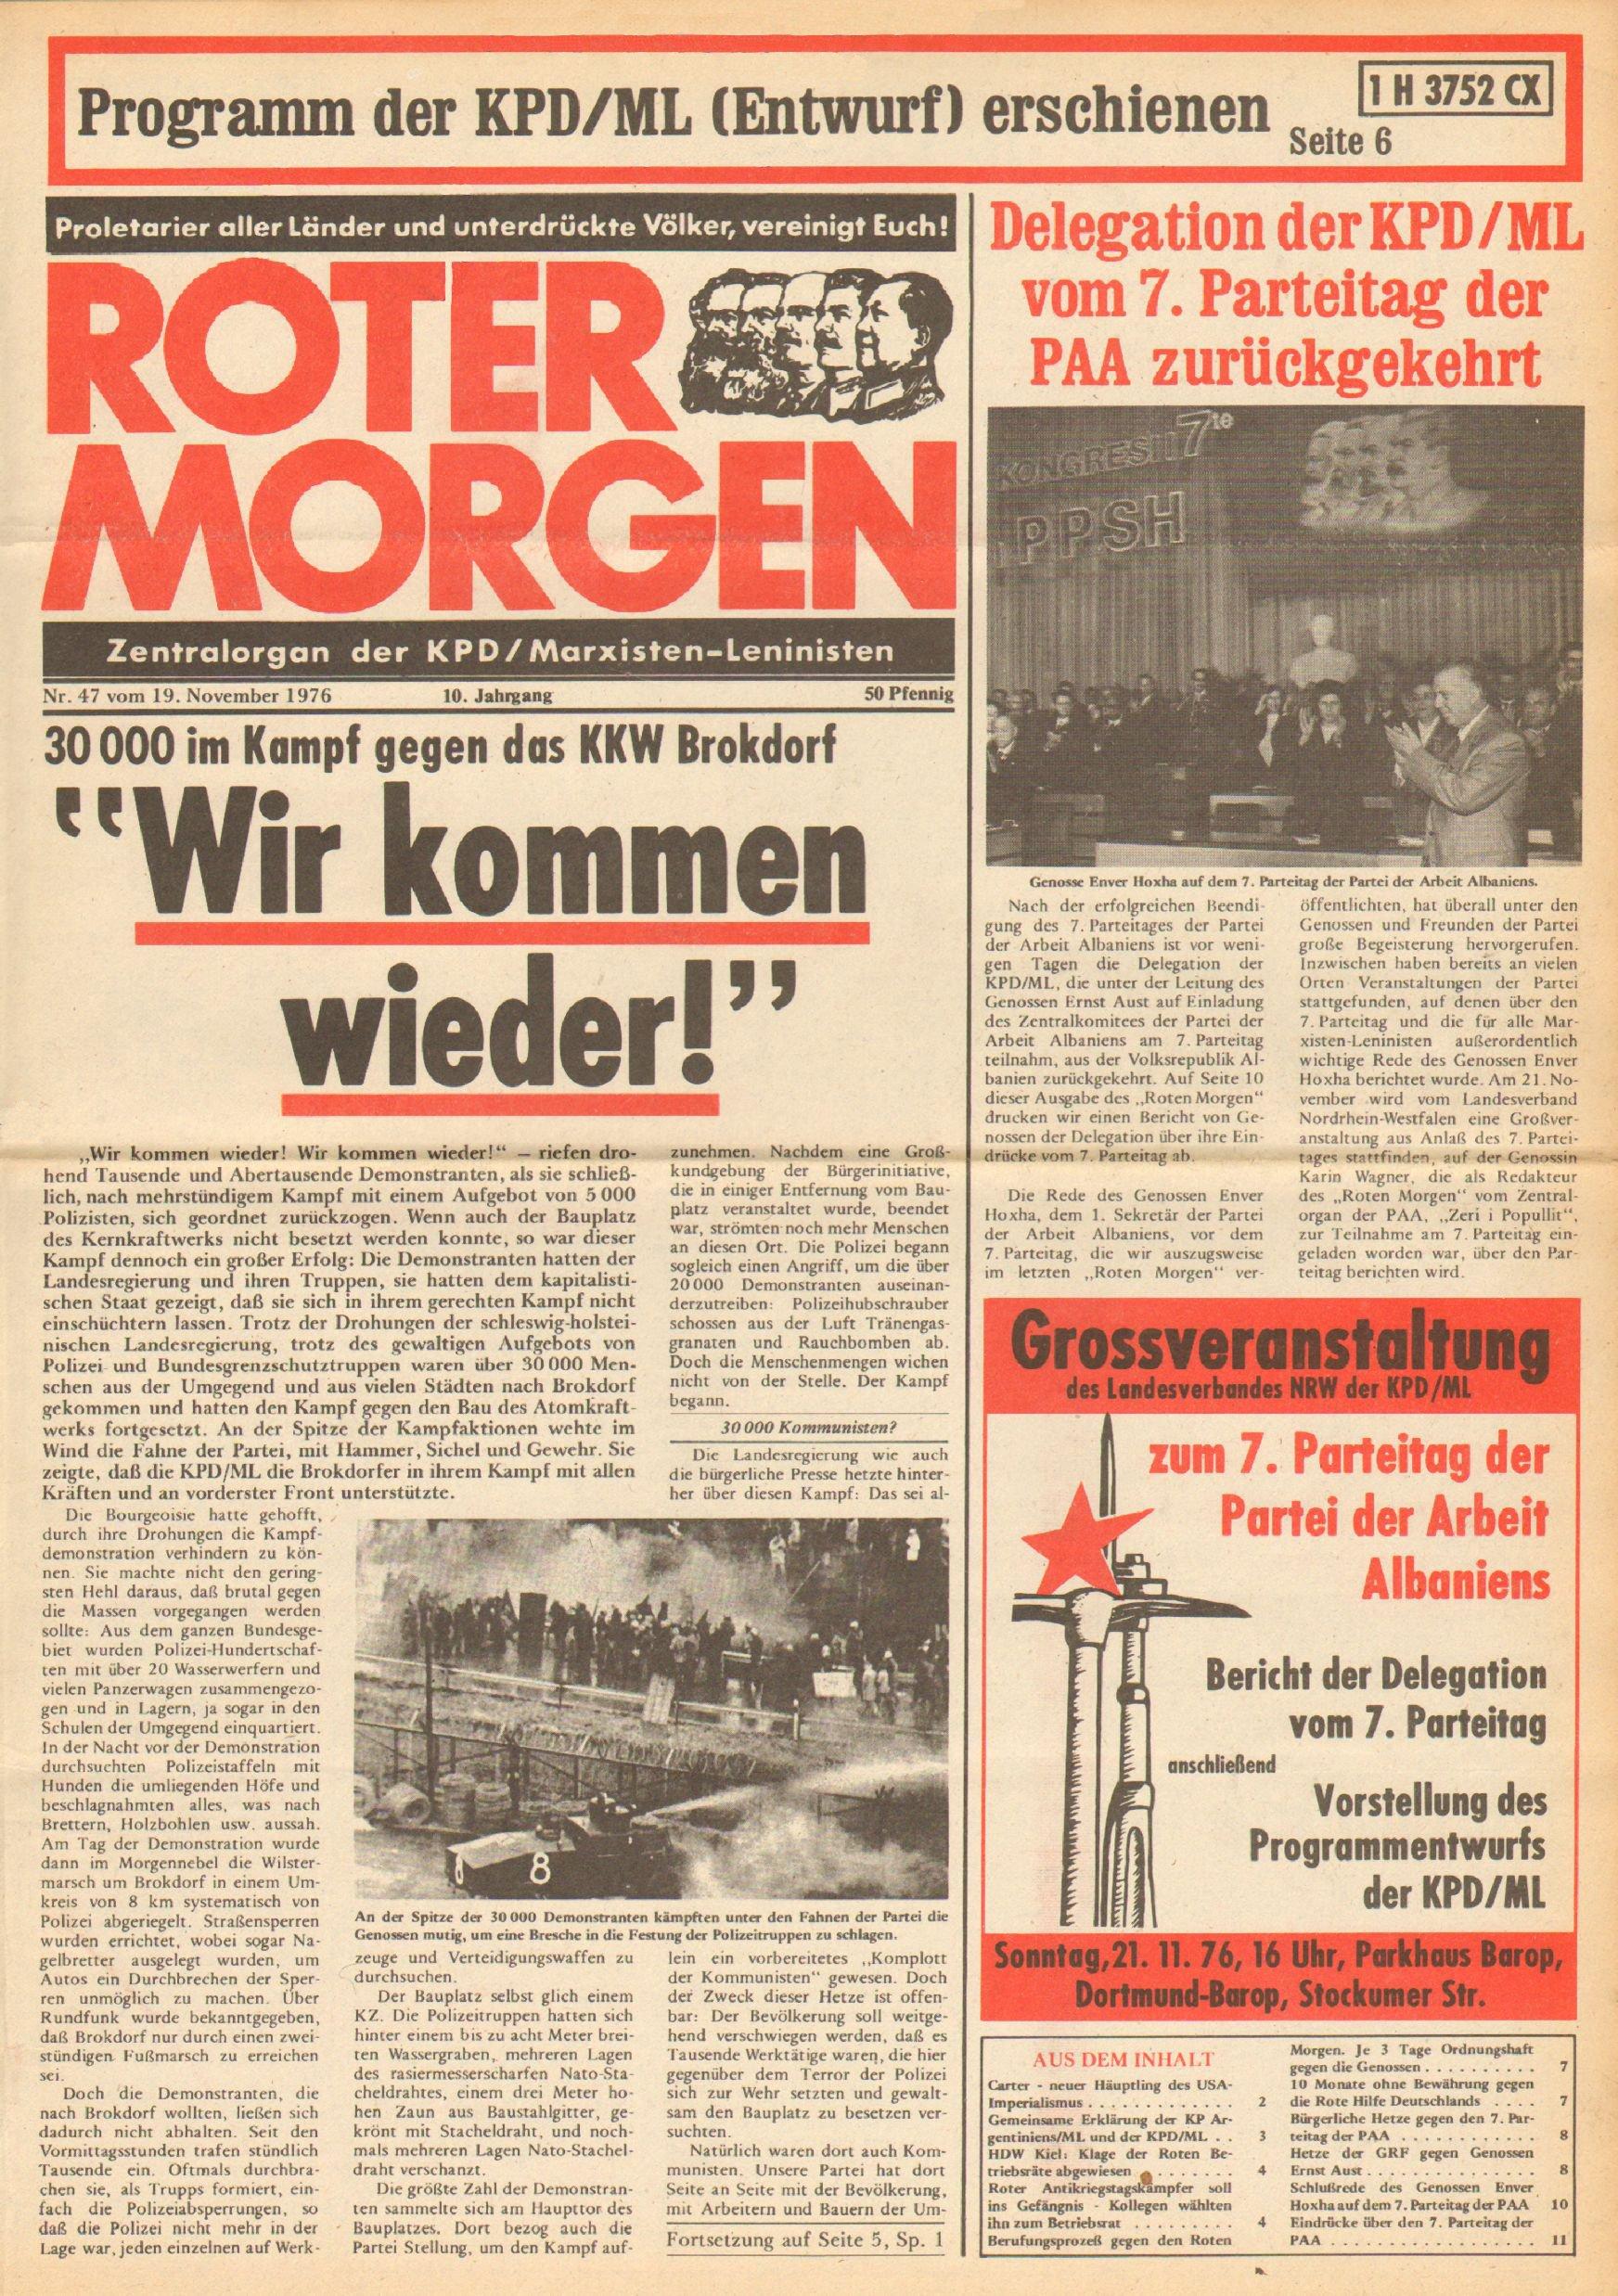 Roter Morgen, 10. Jg., 19. November 1976, Nr. 47, Seite 1